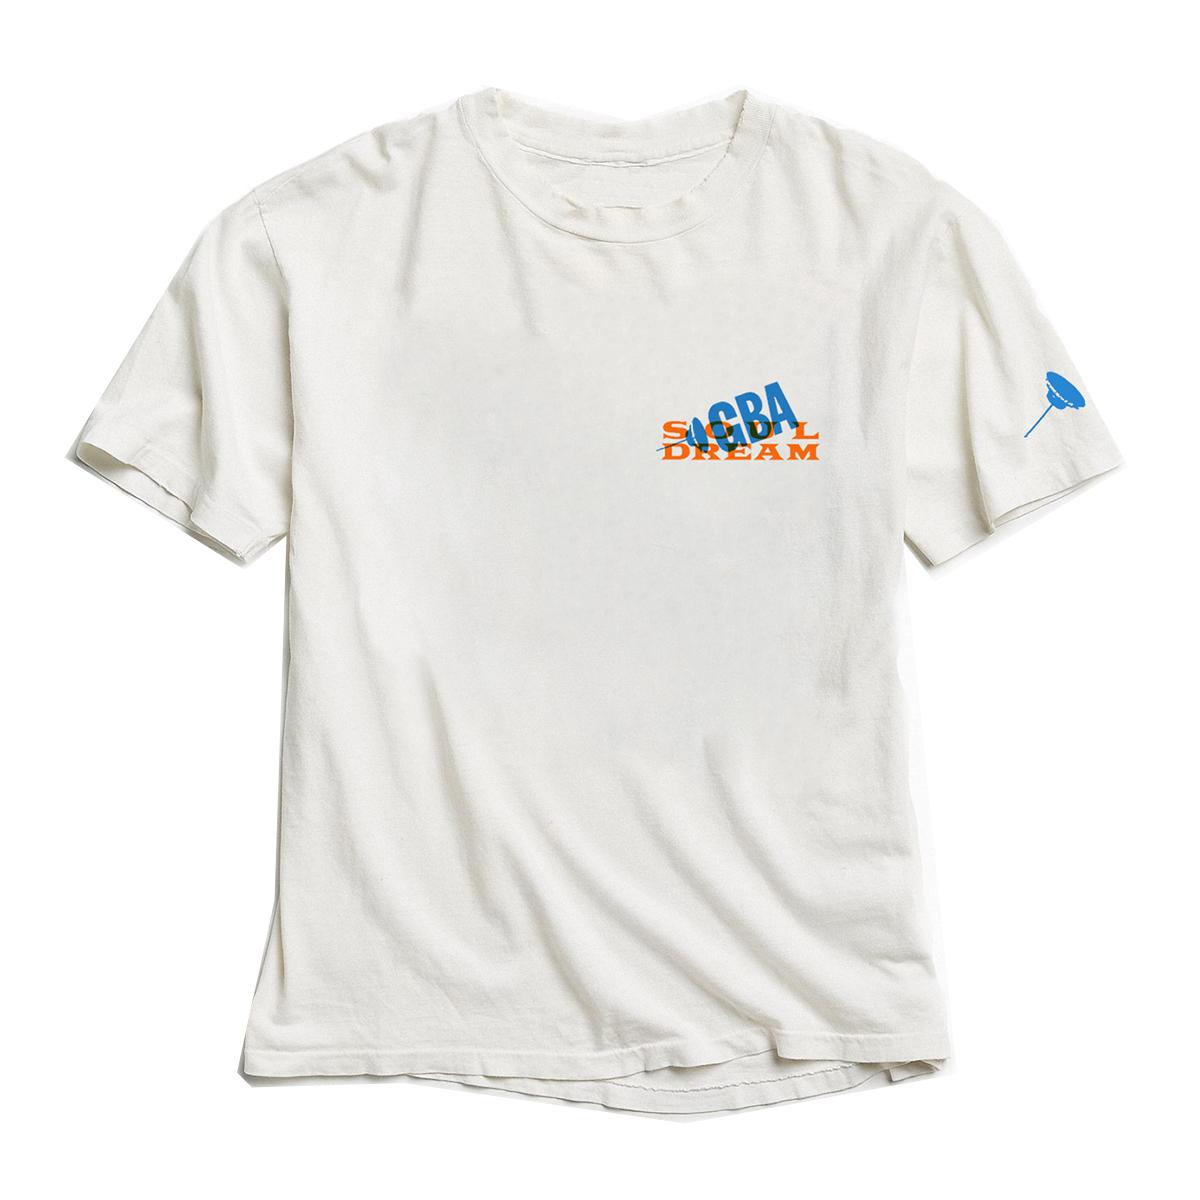 Soul Dream Super Bundle; T-shirt, Hat, Nalgene